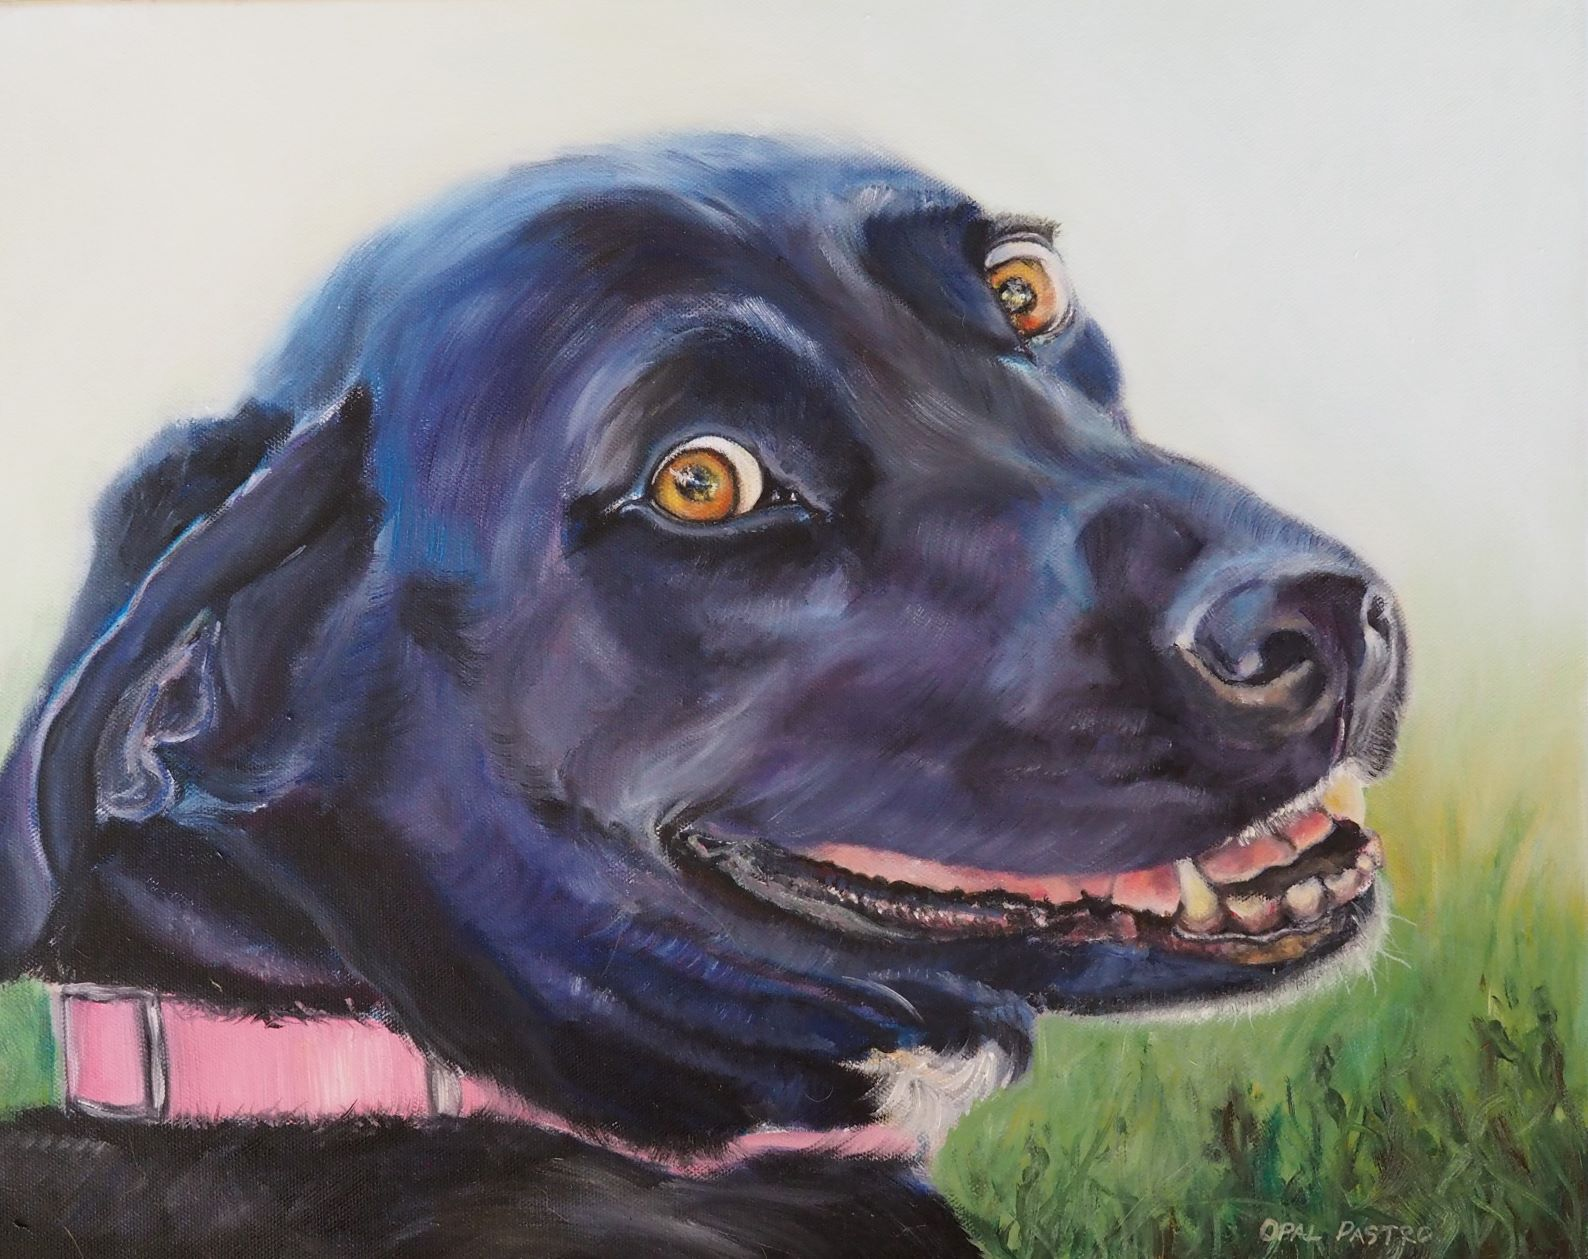 dog-painting-black-smiling-pink-collar-opal-pastro-art.JPG